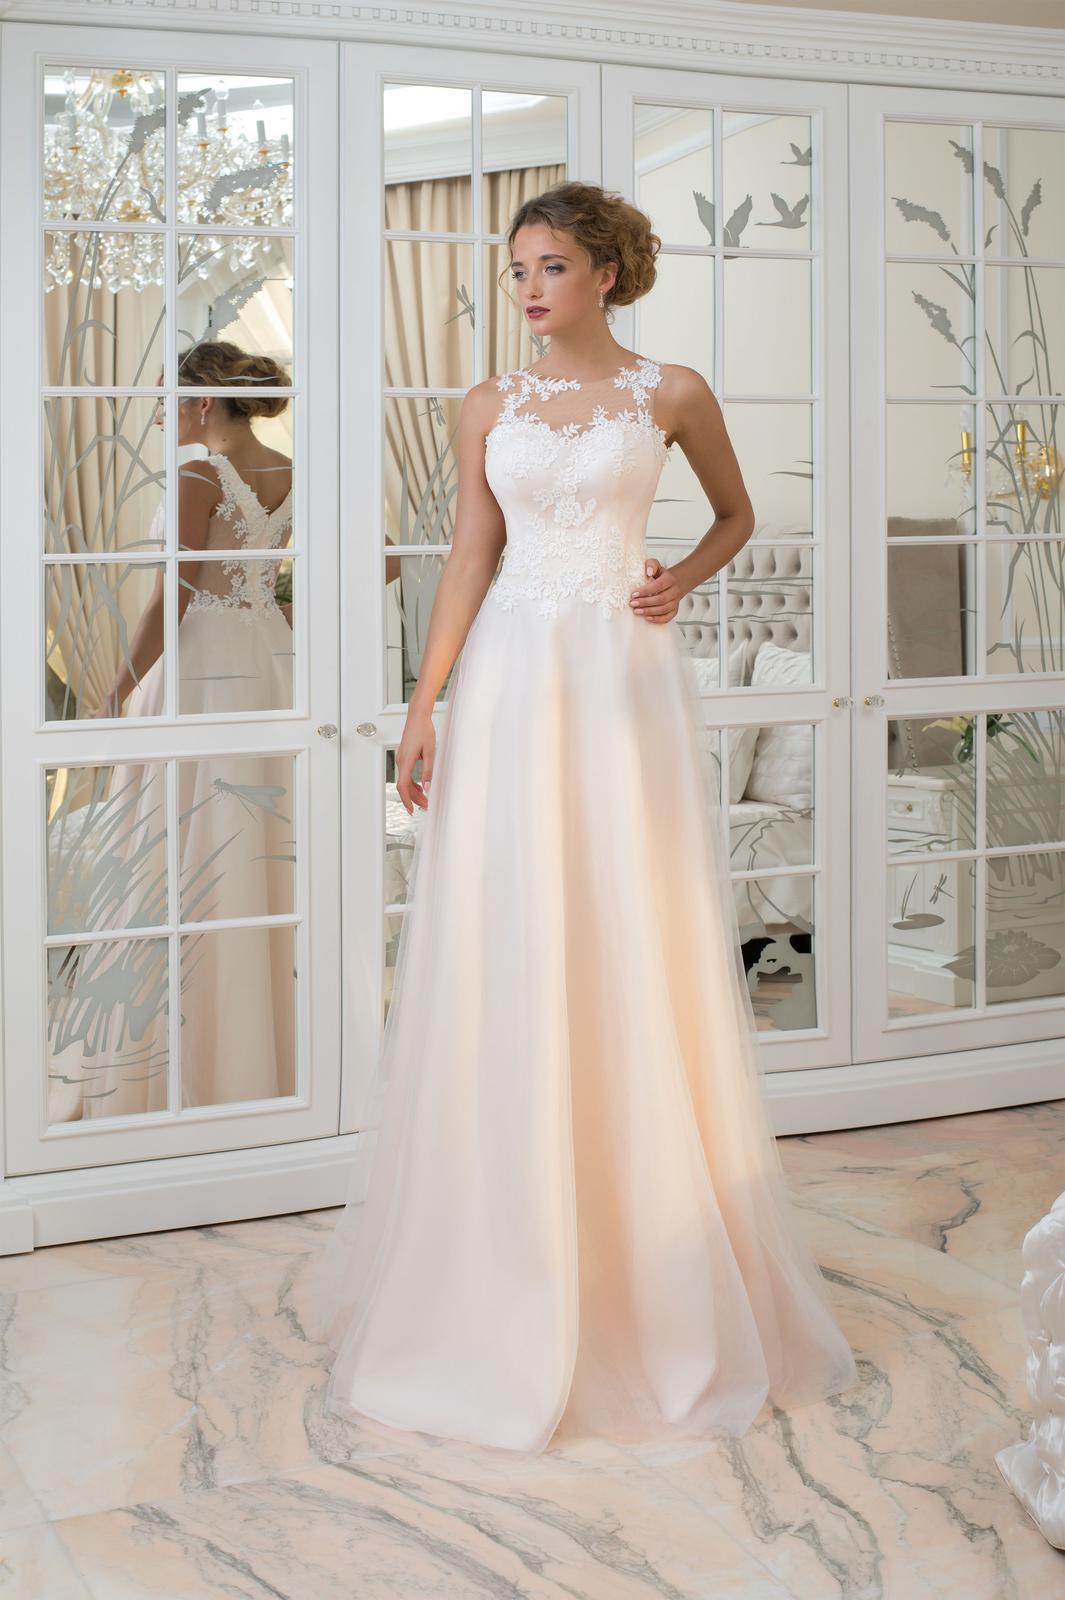 Luxusné dlhé svadobné šaty s decentnou čipkou 774db4b3964